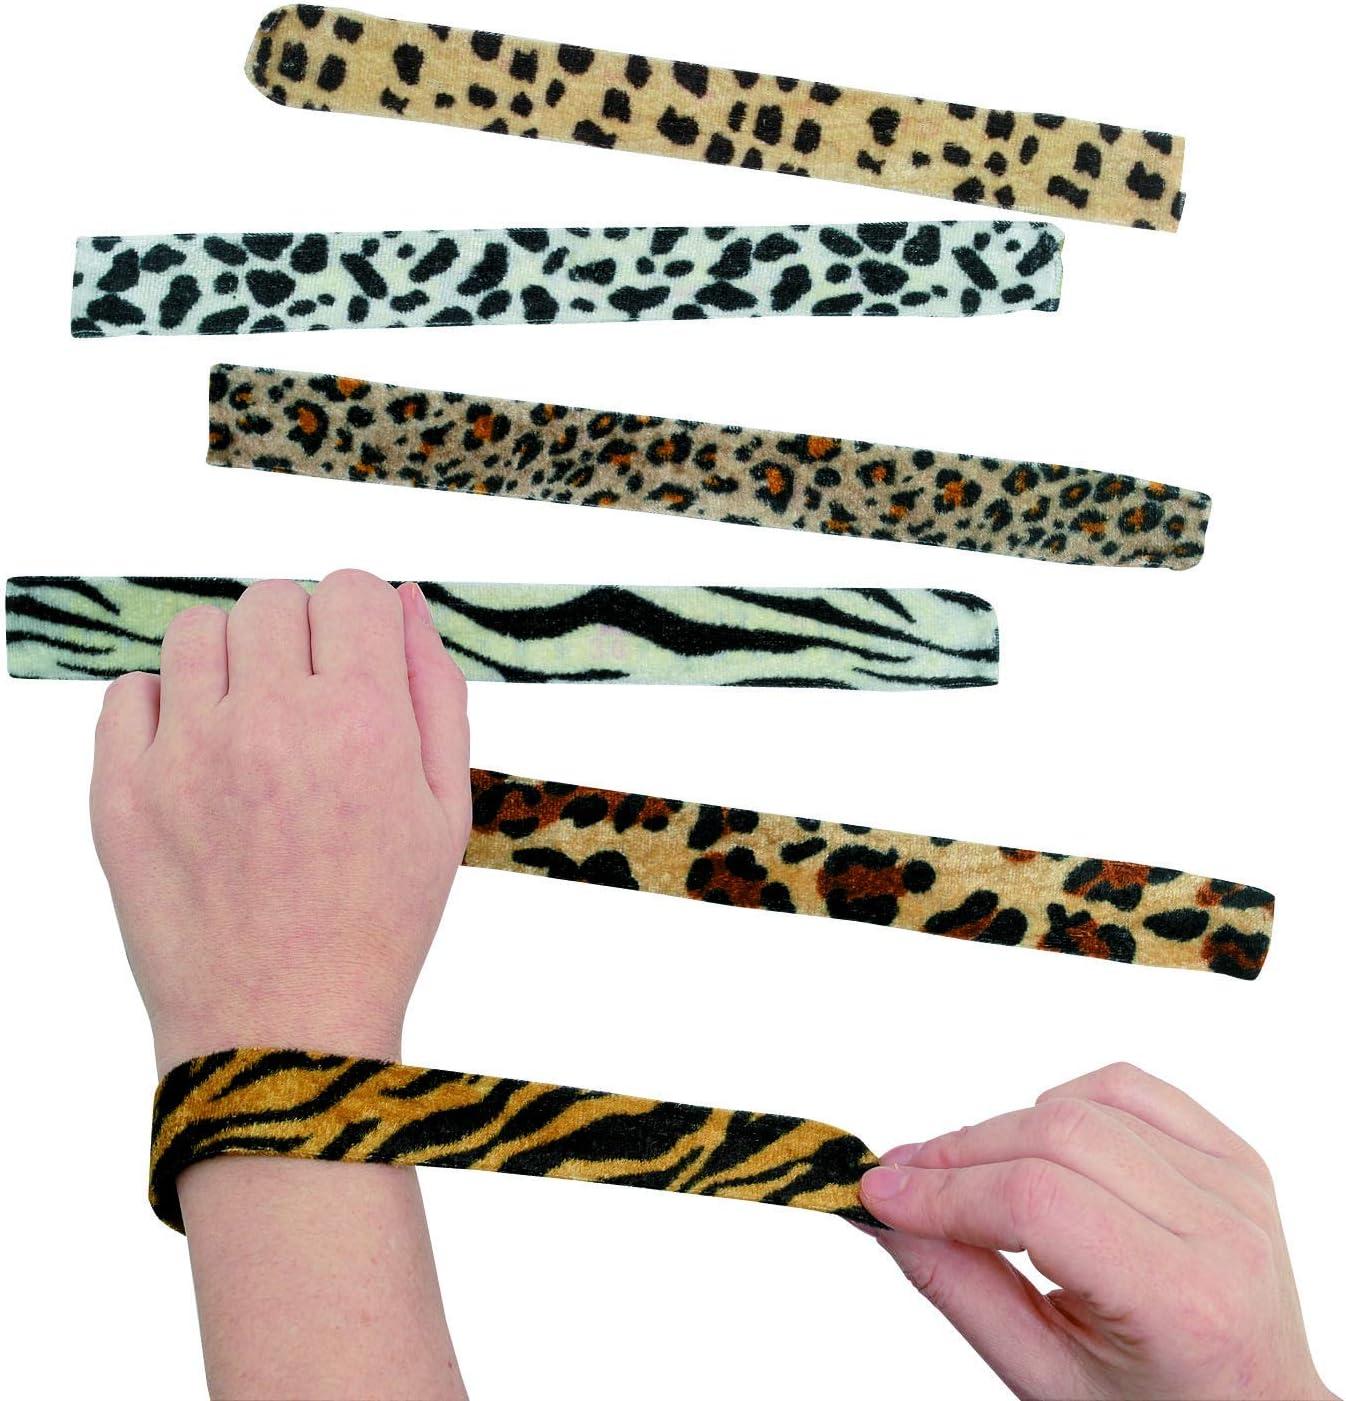 B0001ZJ7NK Fun Express Animal Print Slap Bracelets - Assorted 12 Pack 71u0WV5adpL